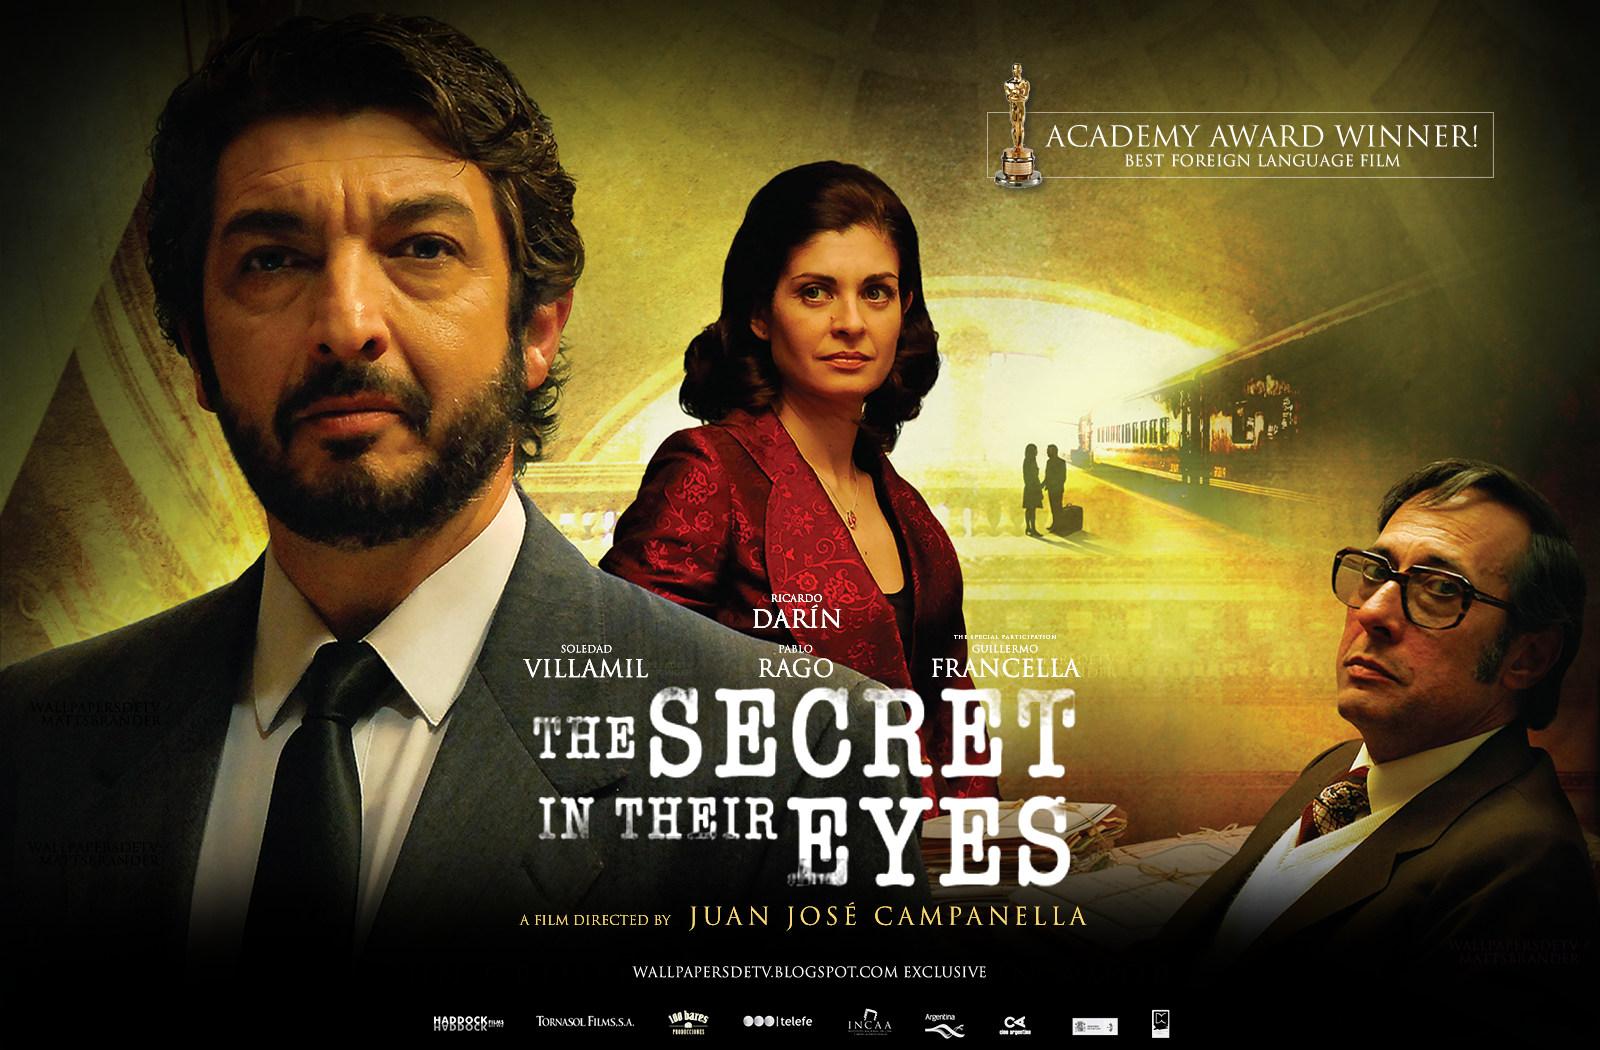 The secret in their eyes 2009 kickass